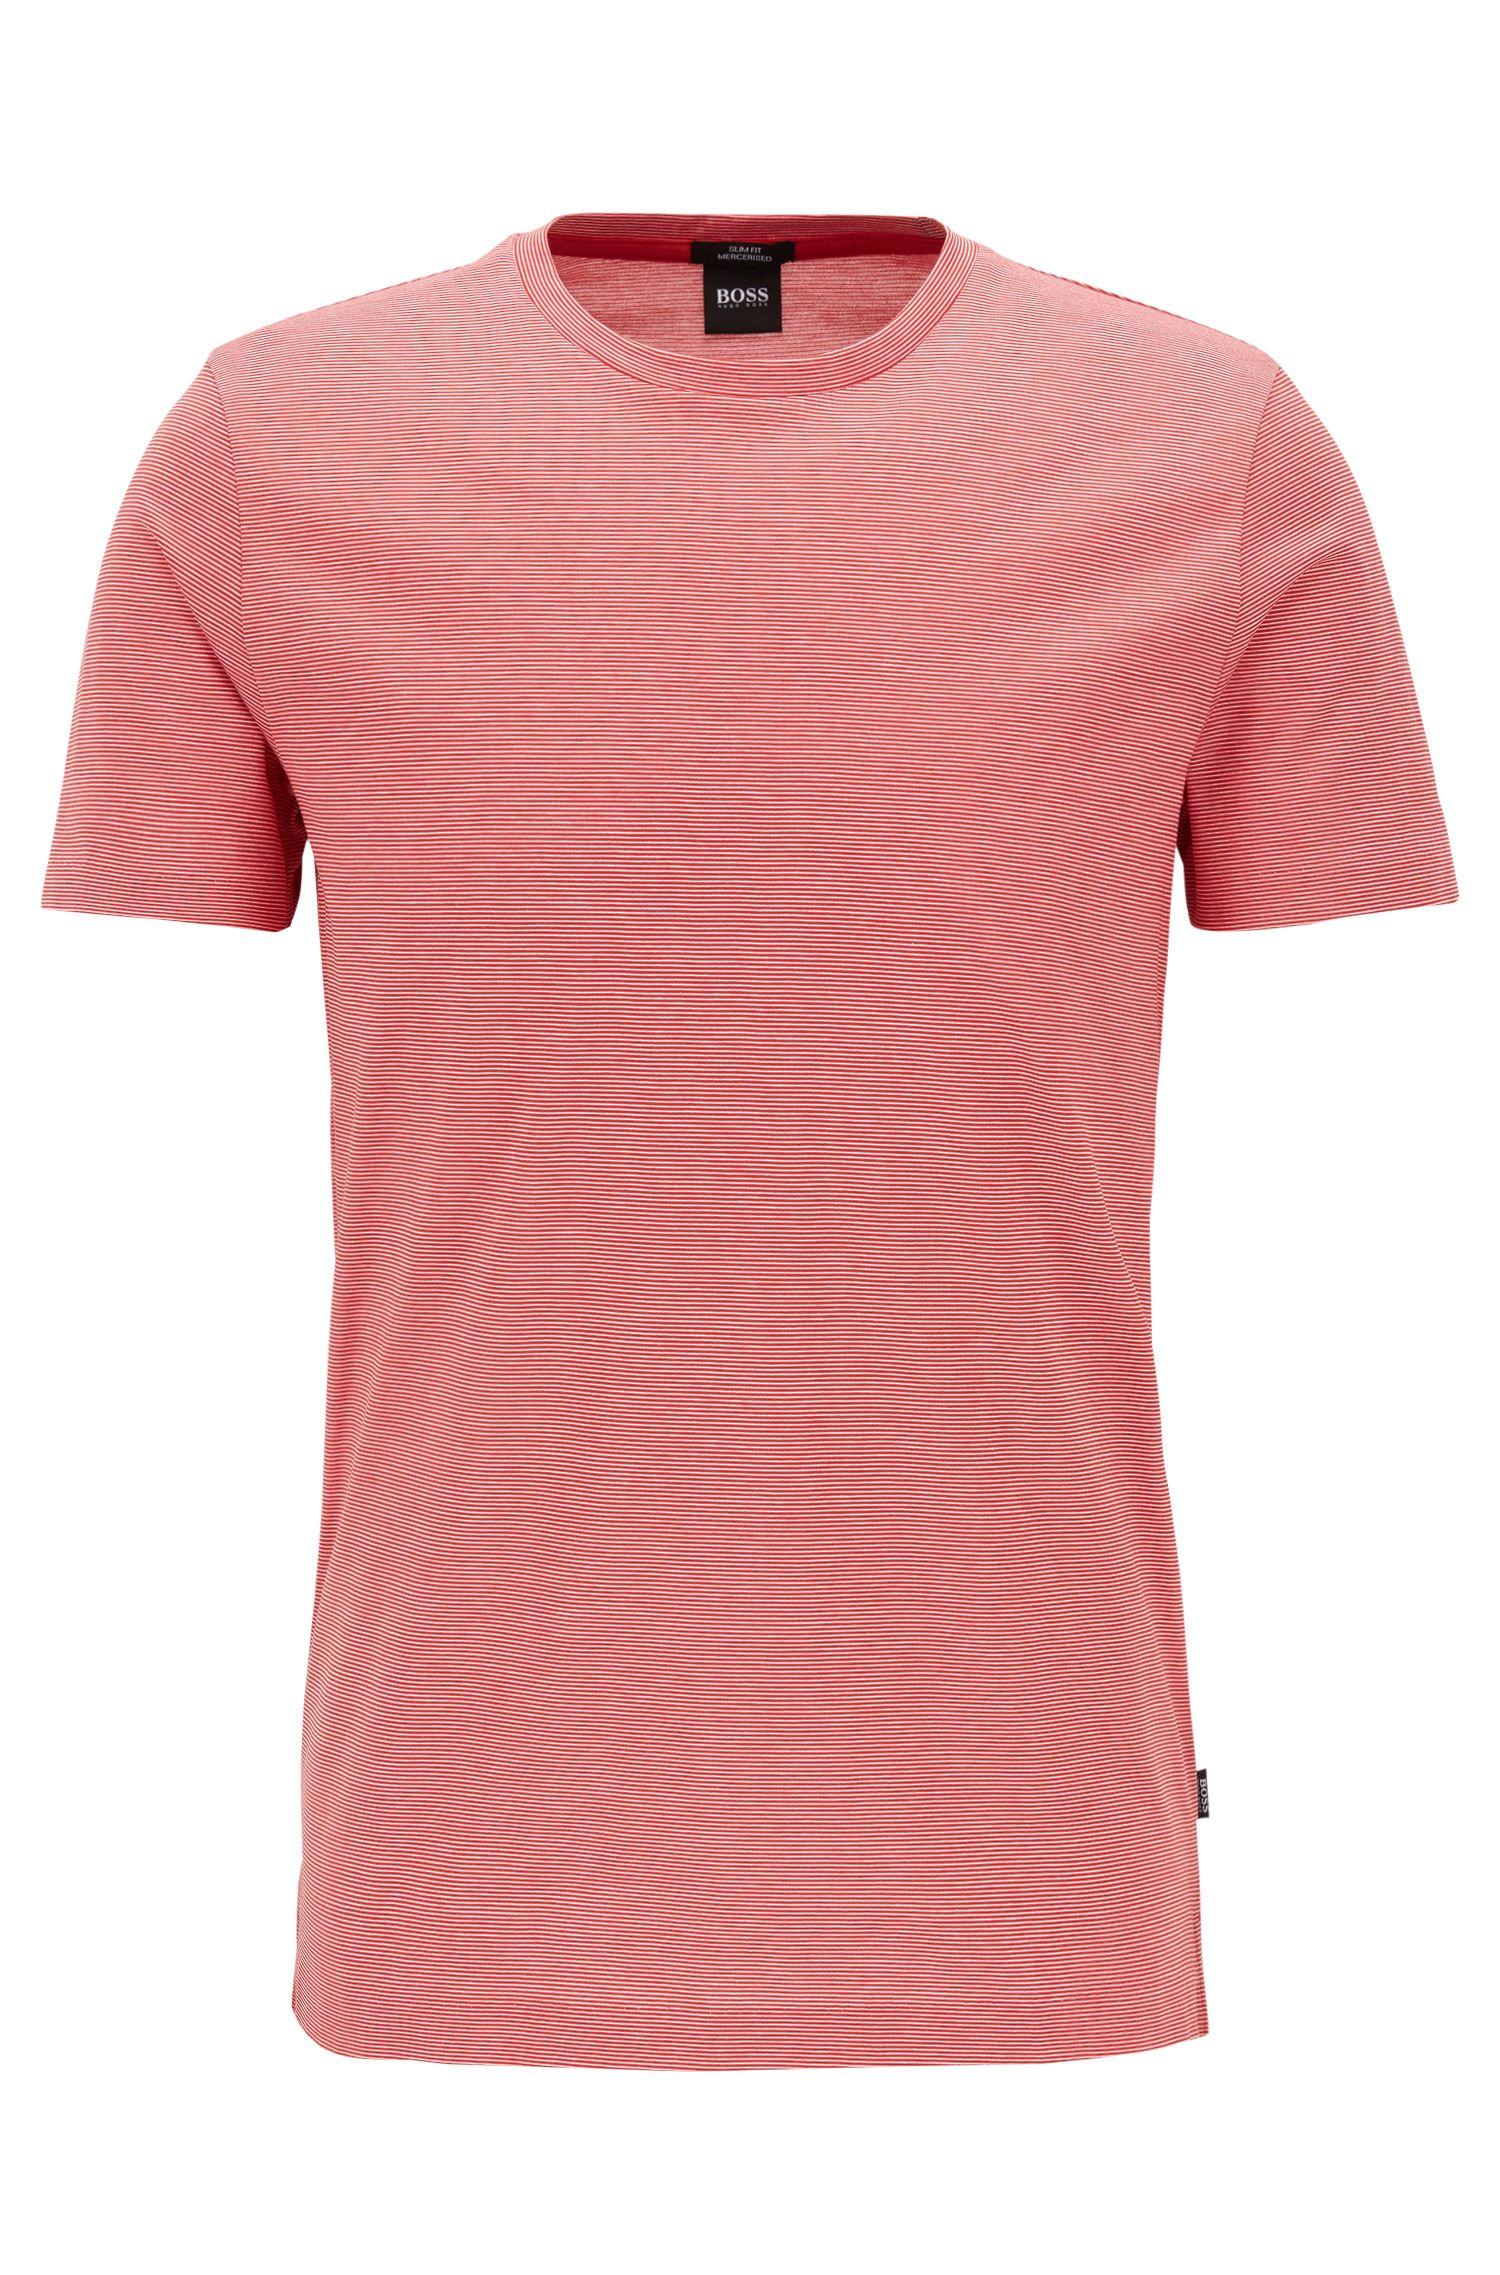 Mercerized Cotton T-Shirt | Tessler, Dark pink